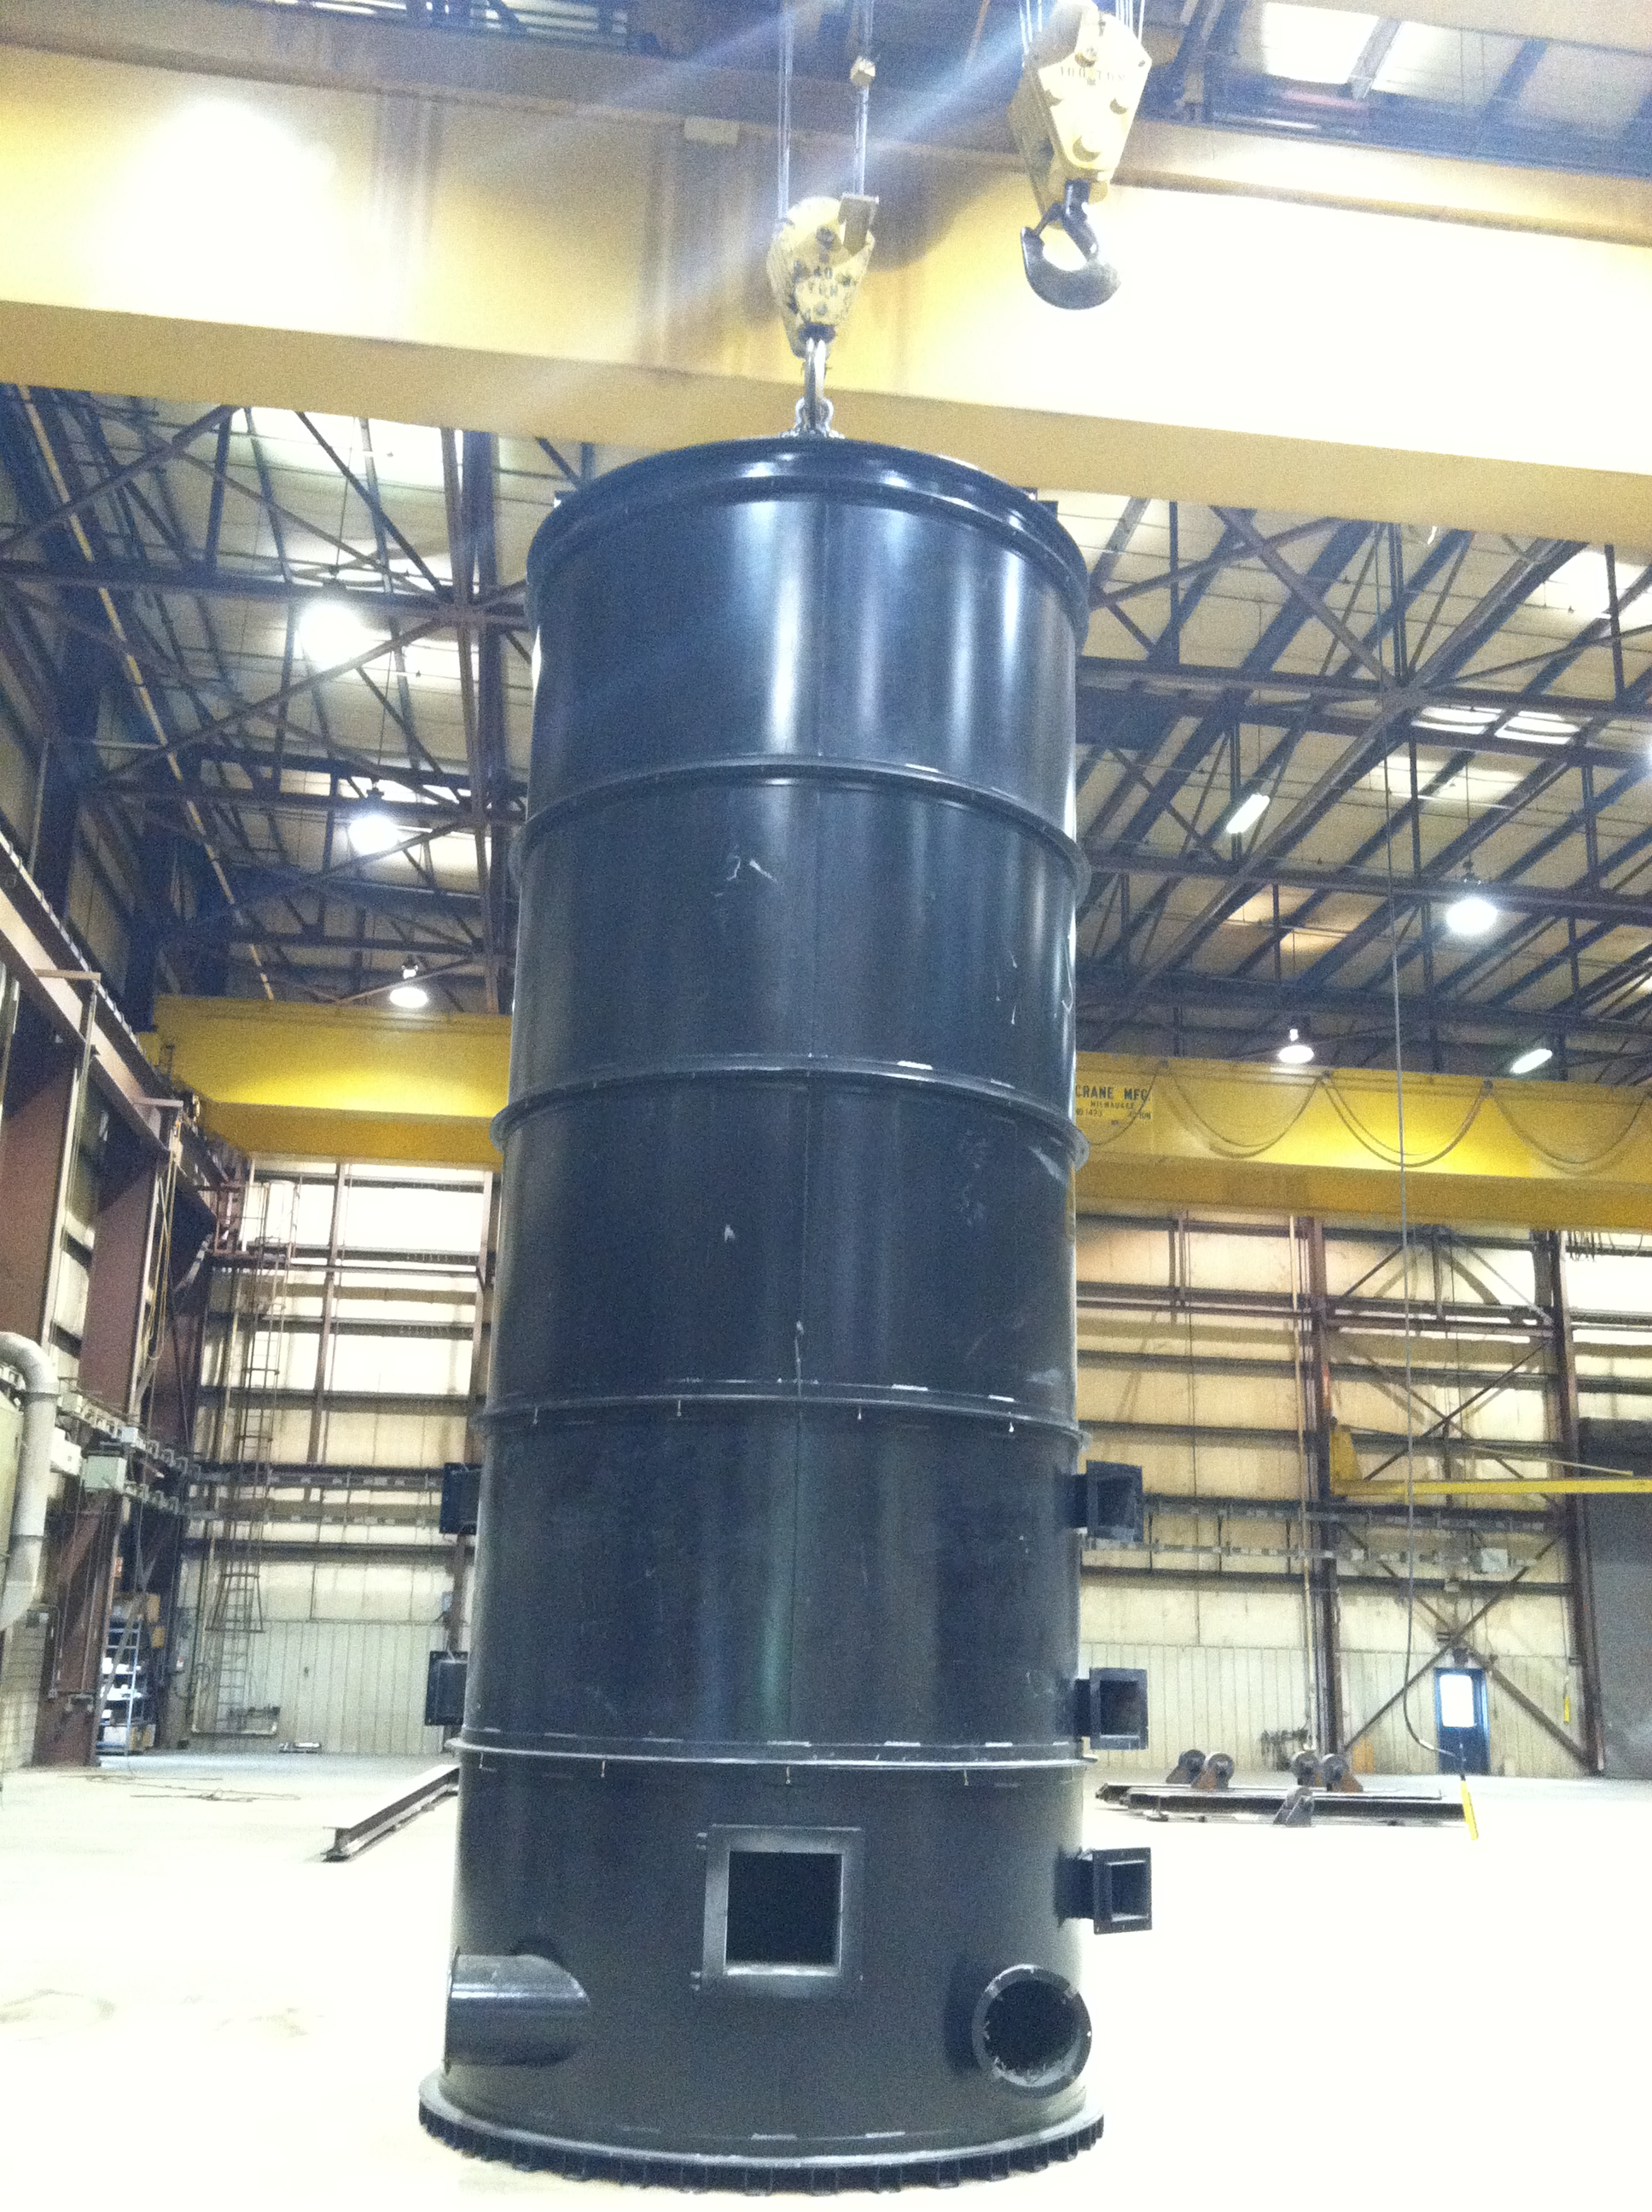 solid fuel burner rotary dryer